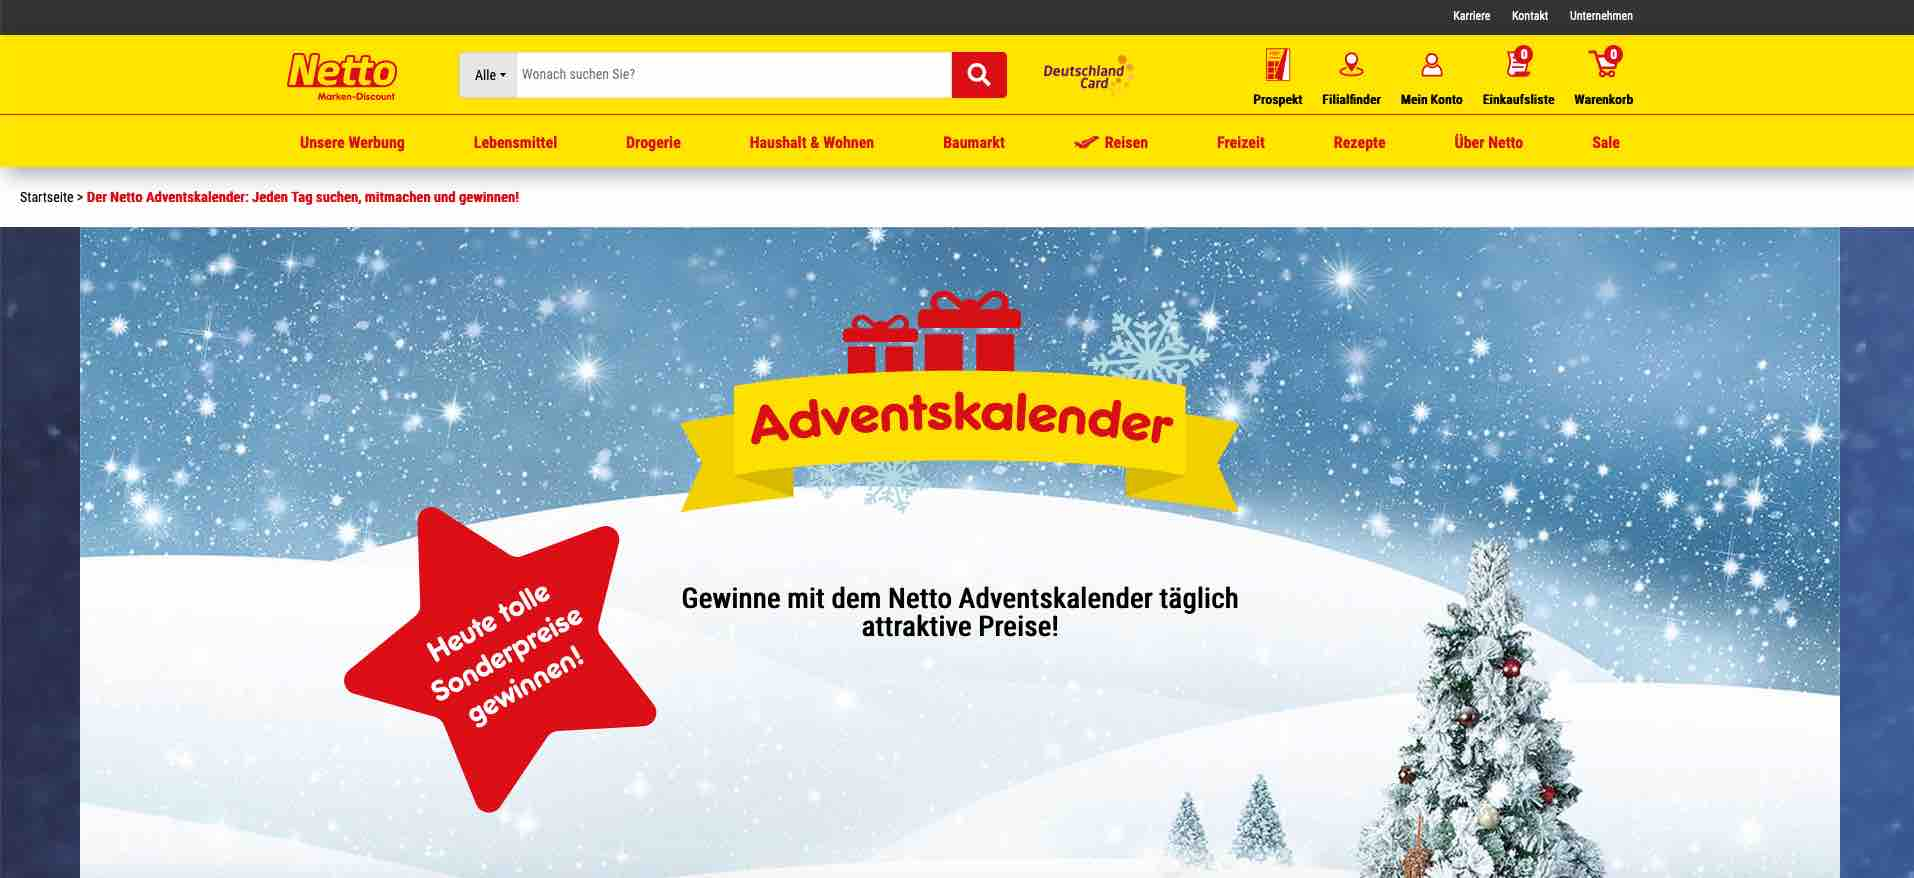 Netto Online Adventskalender